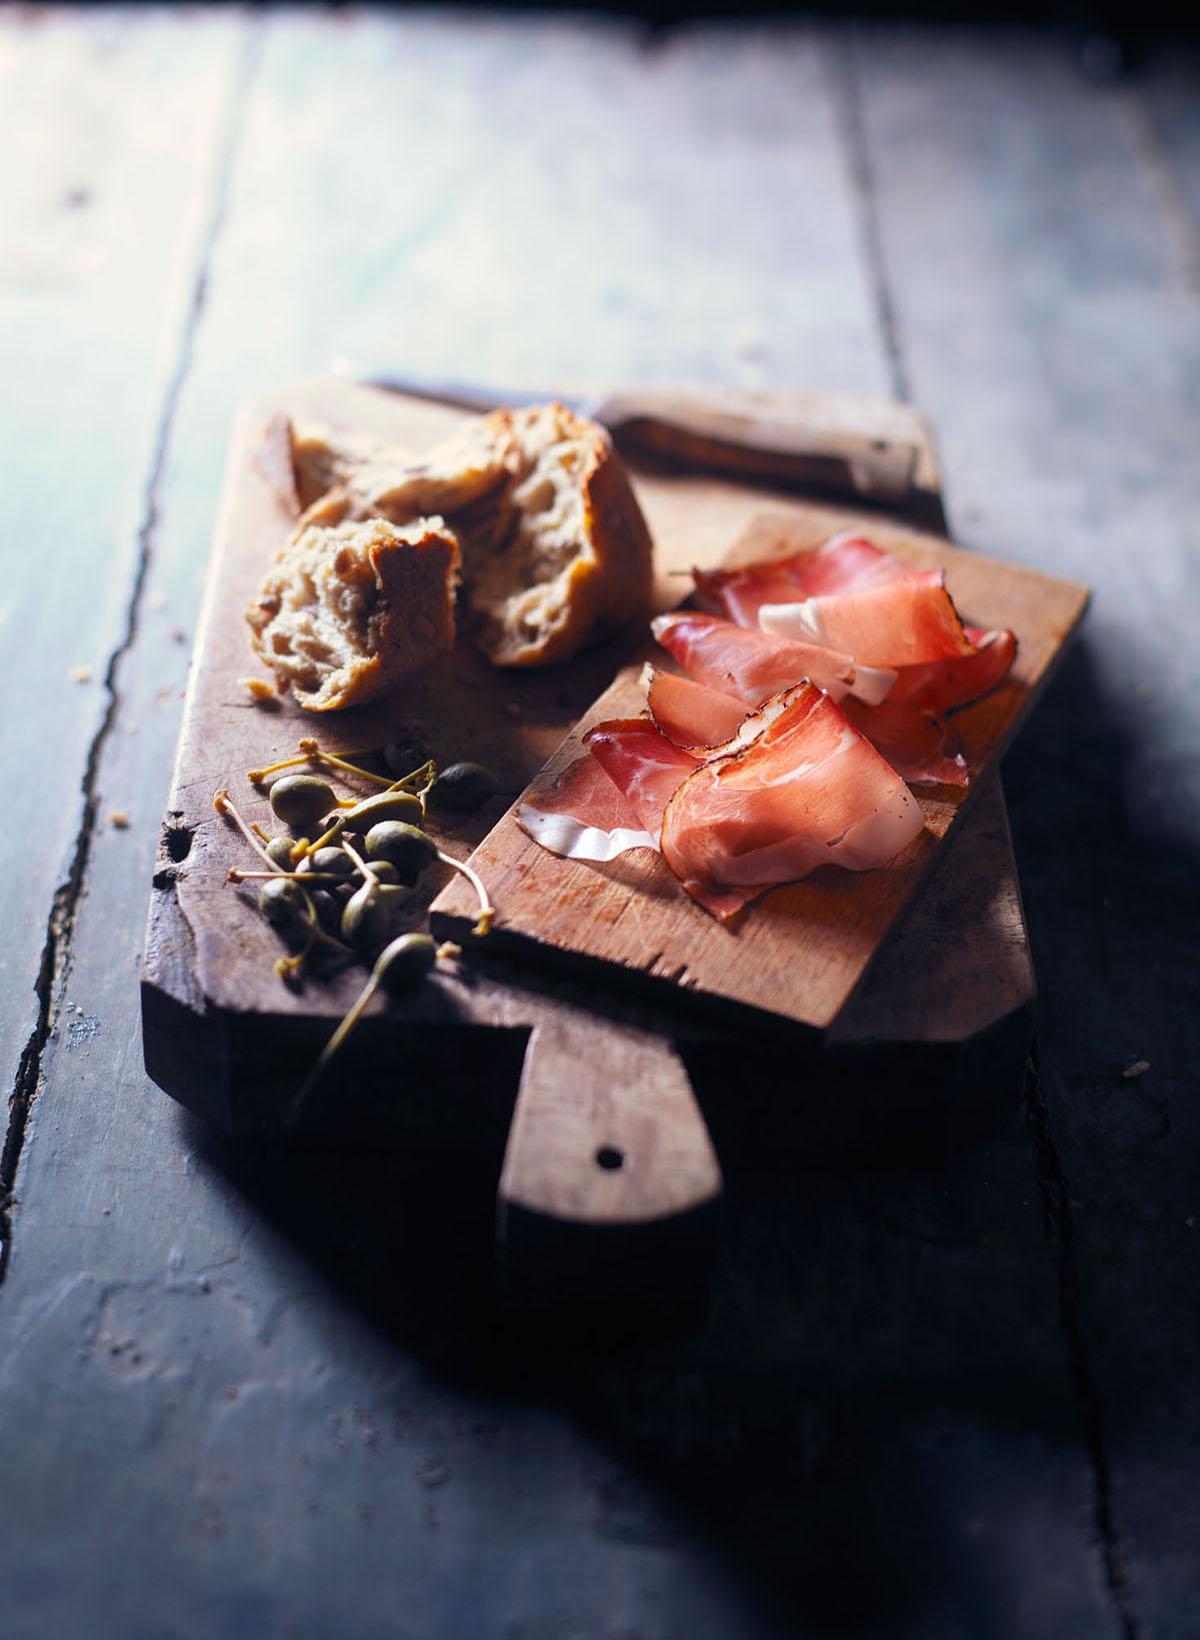 Brood, worst, kaas Mes scherp achter  OL  004